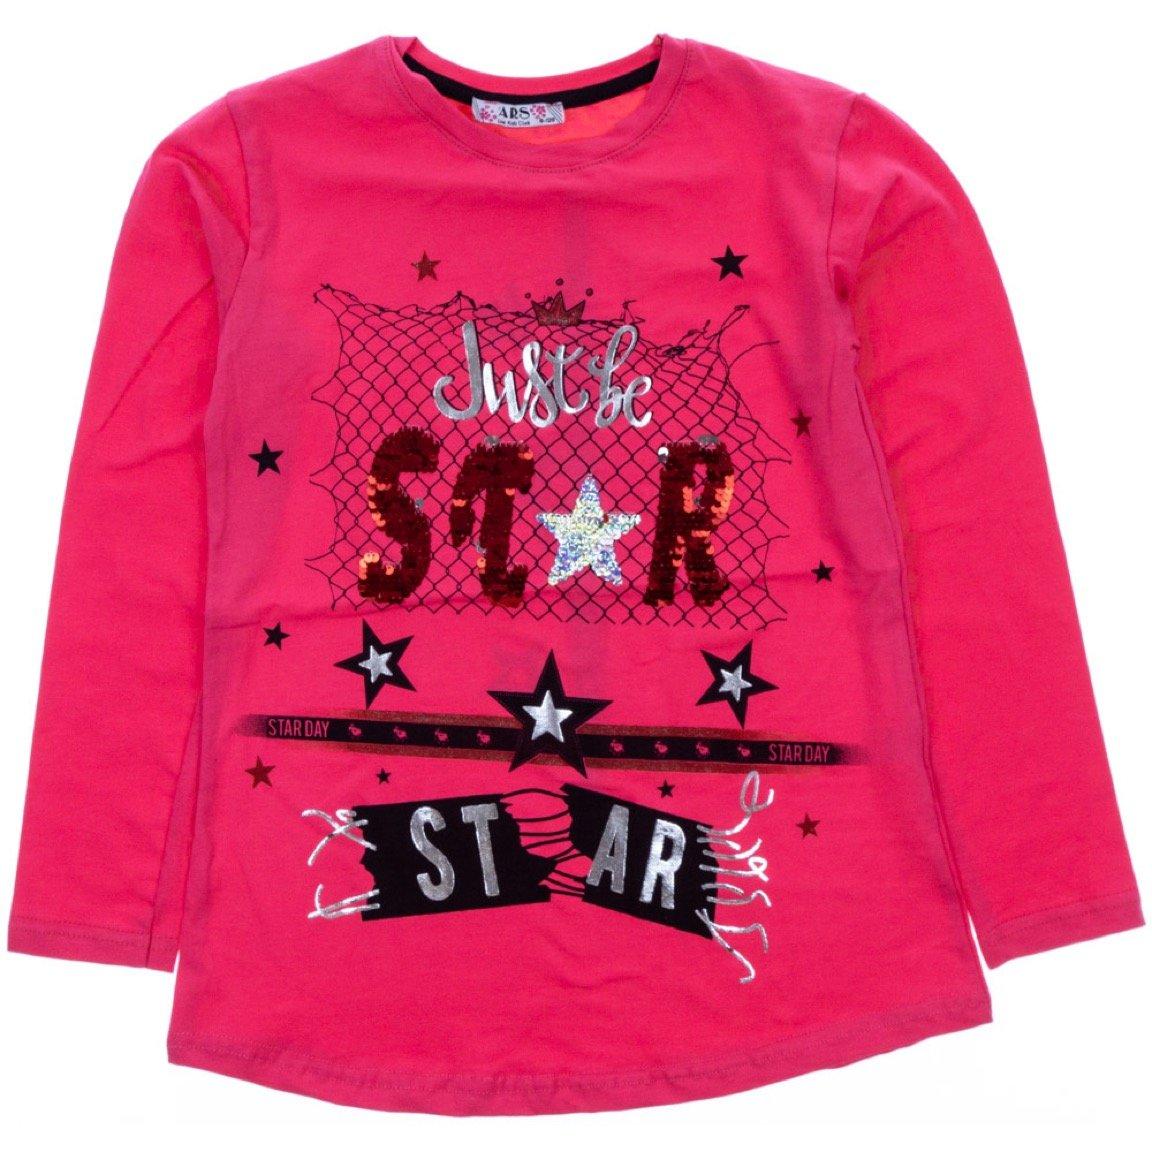 ARS παιδική εποχιακή μπλούζα «Coral Star Day»